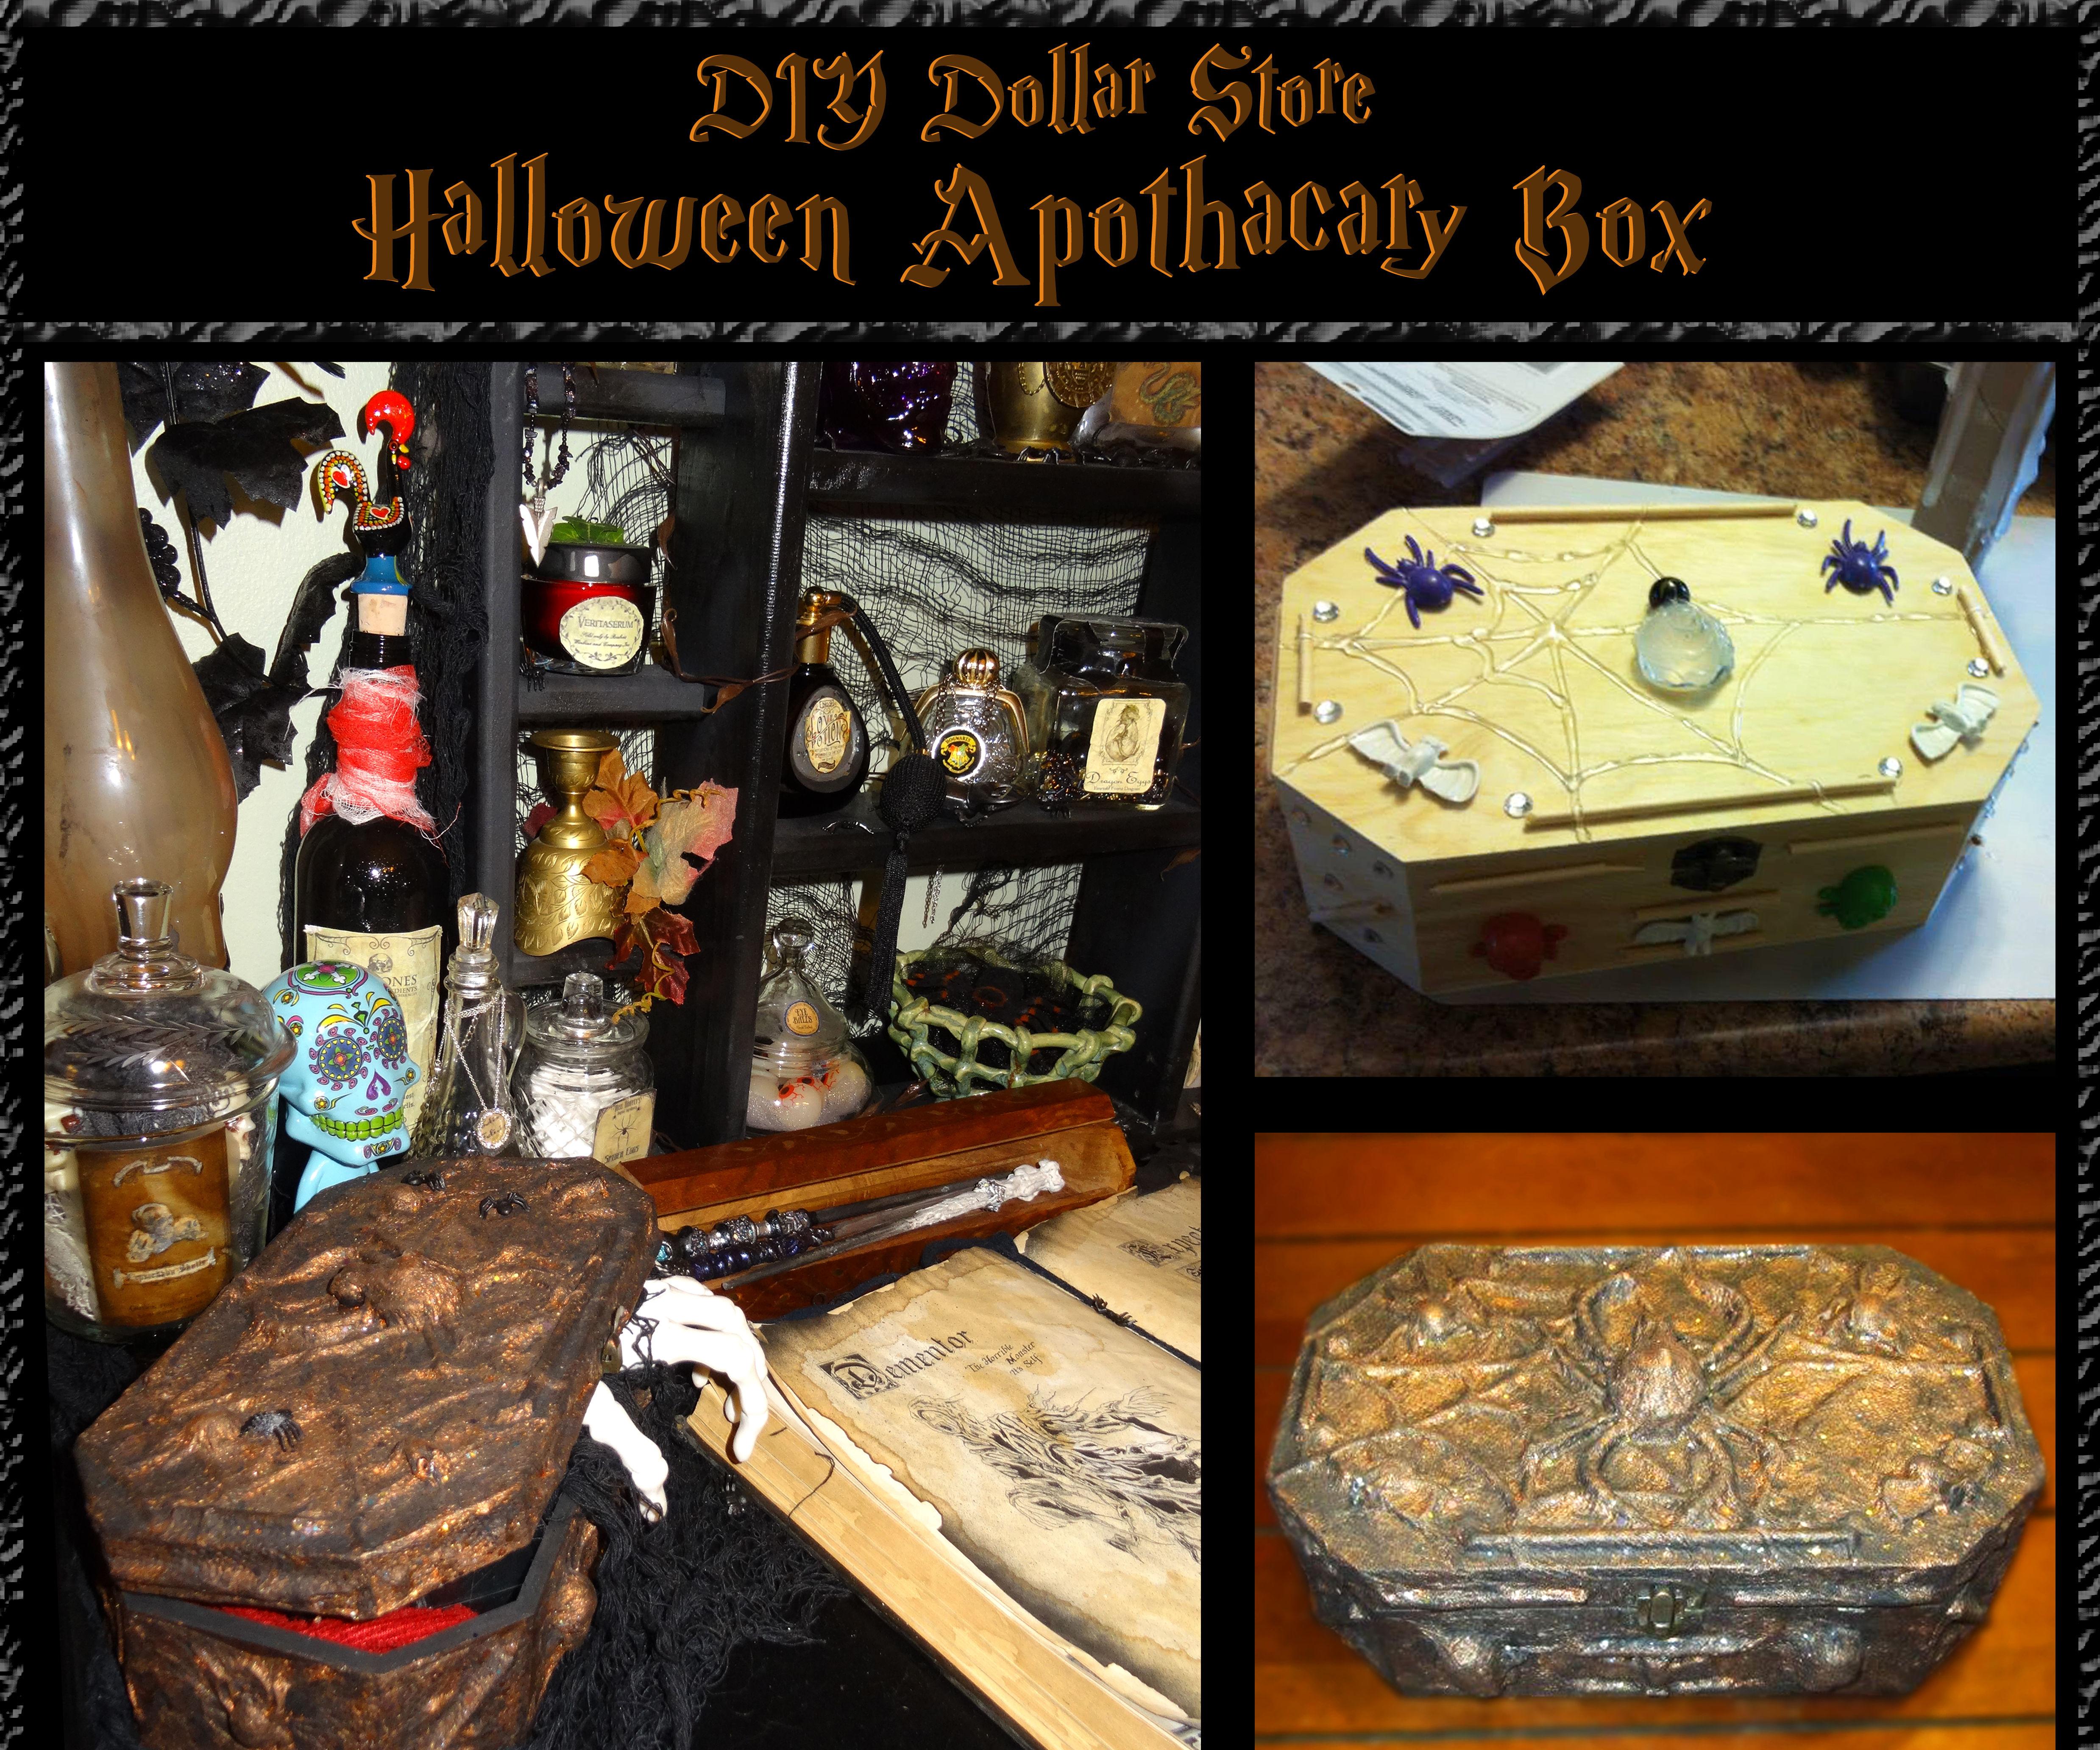 Halloween Apothecary Box